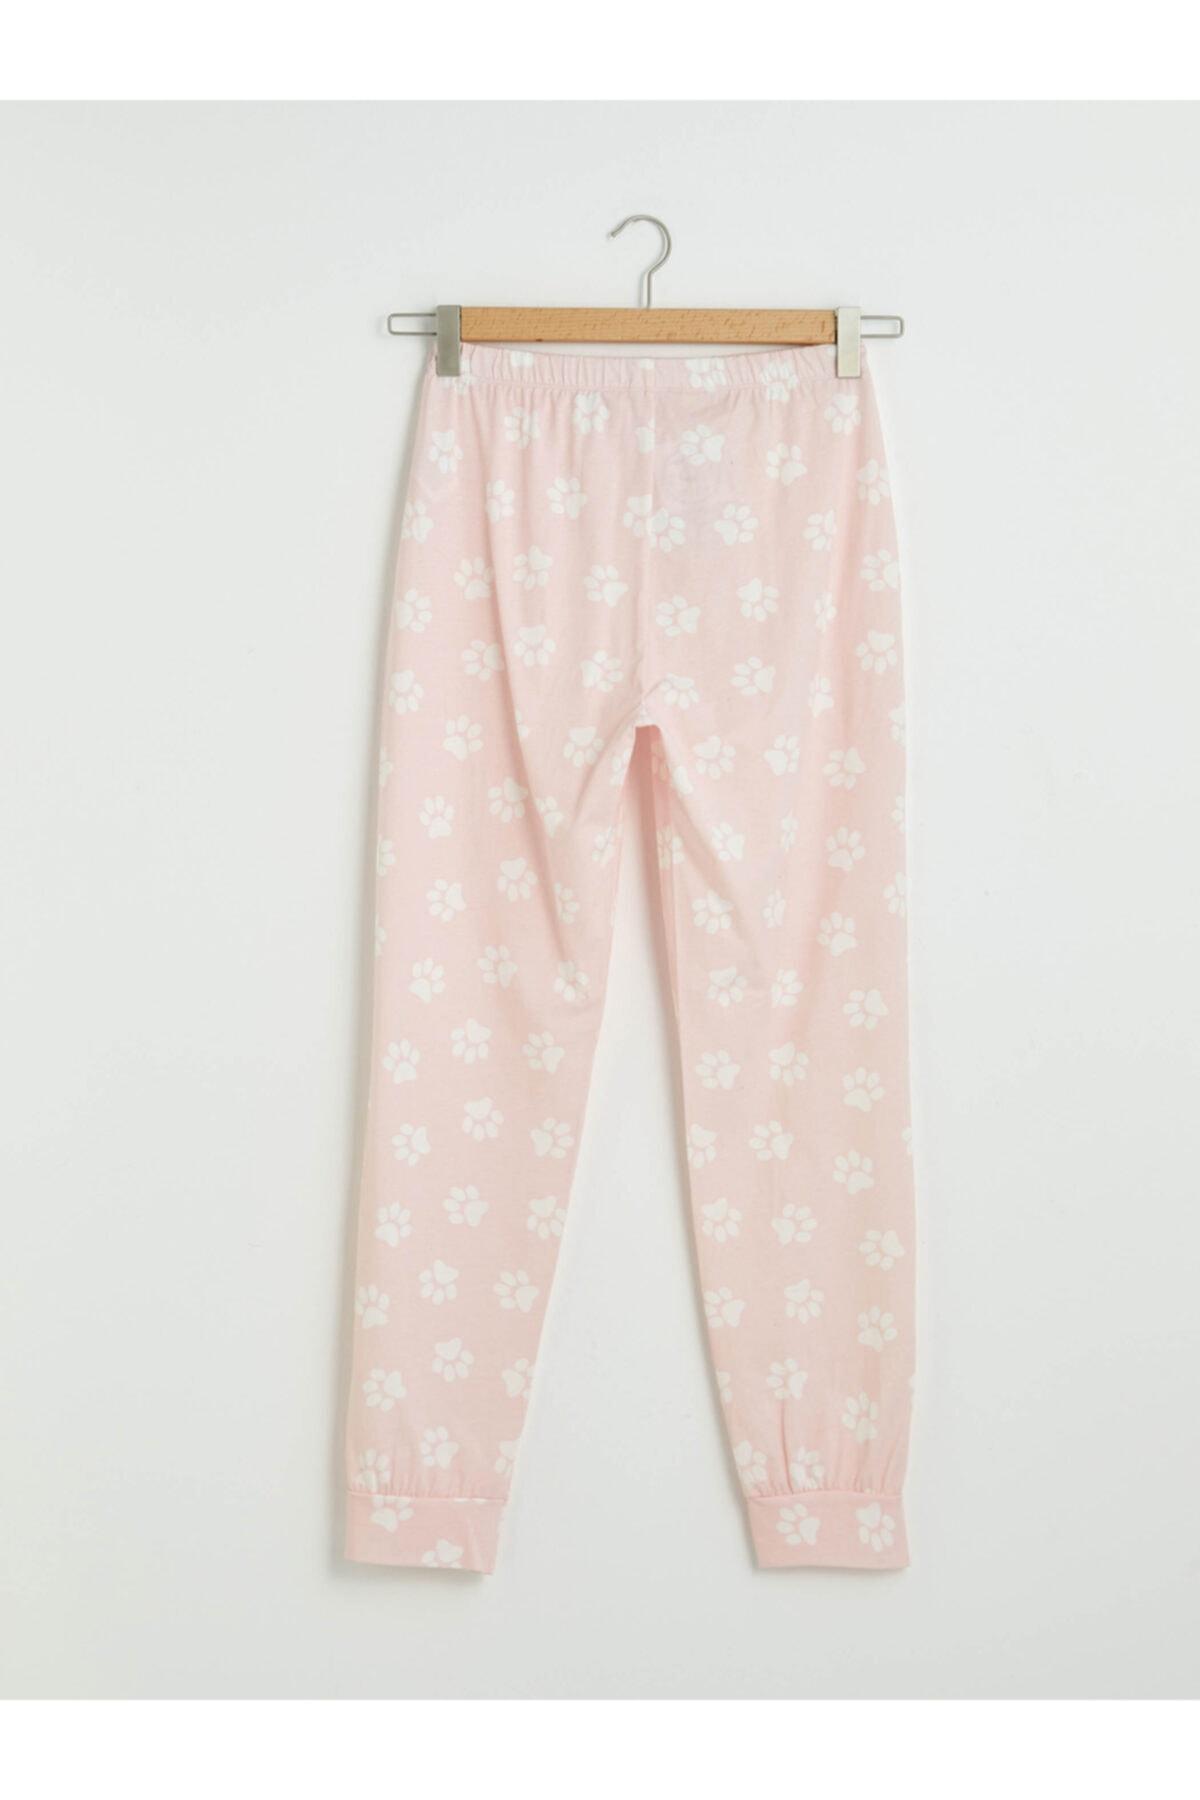 LC Waikiki Kadın Pembe Pijama Altı 2